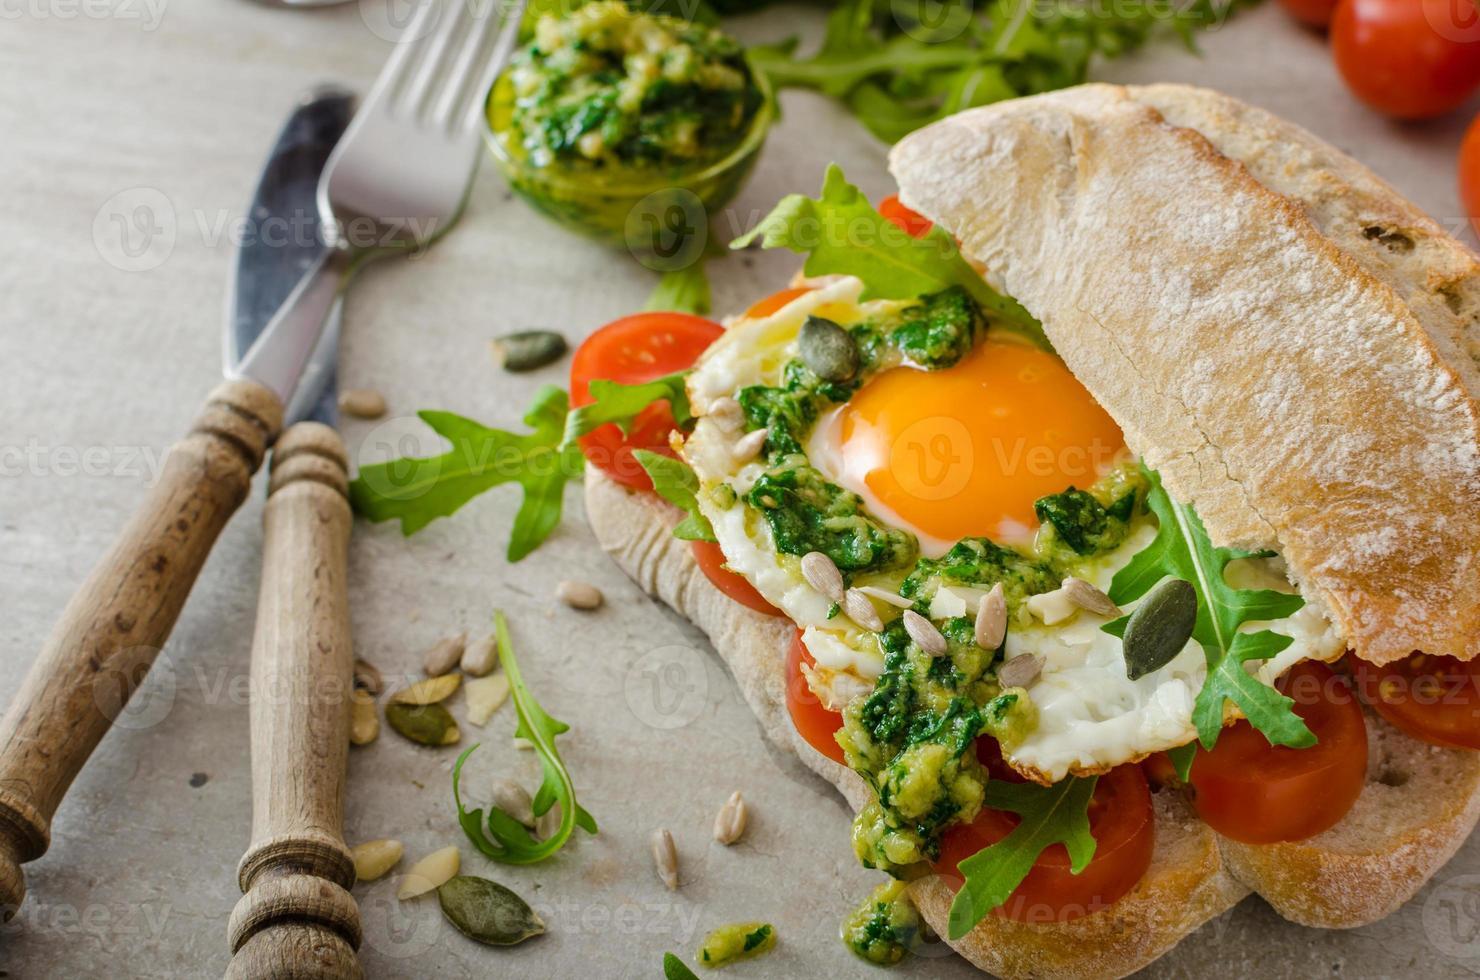 ciabatta aux œufs frits, tomates et pesto photo